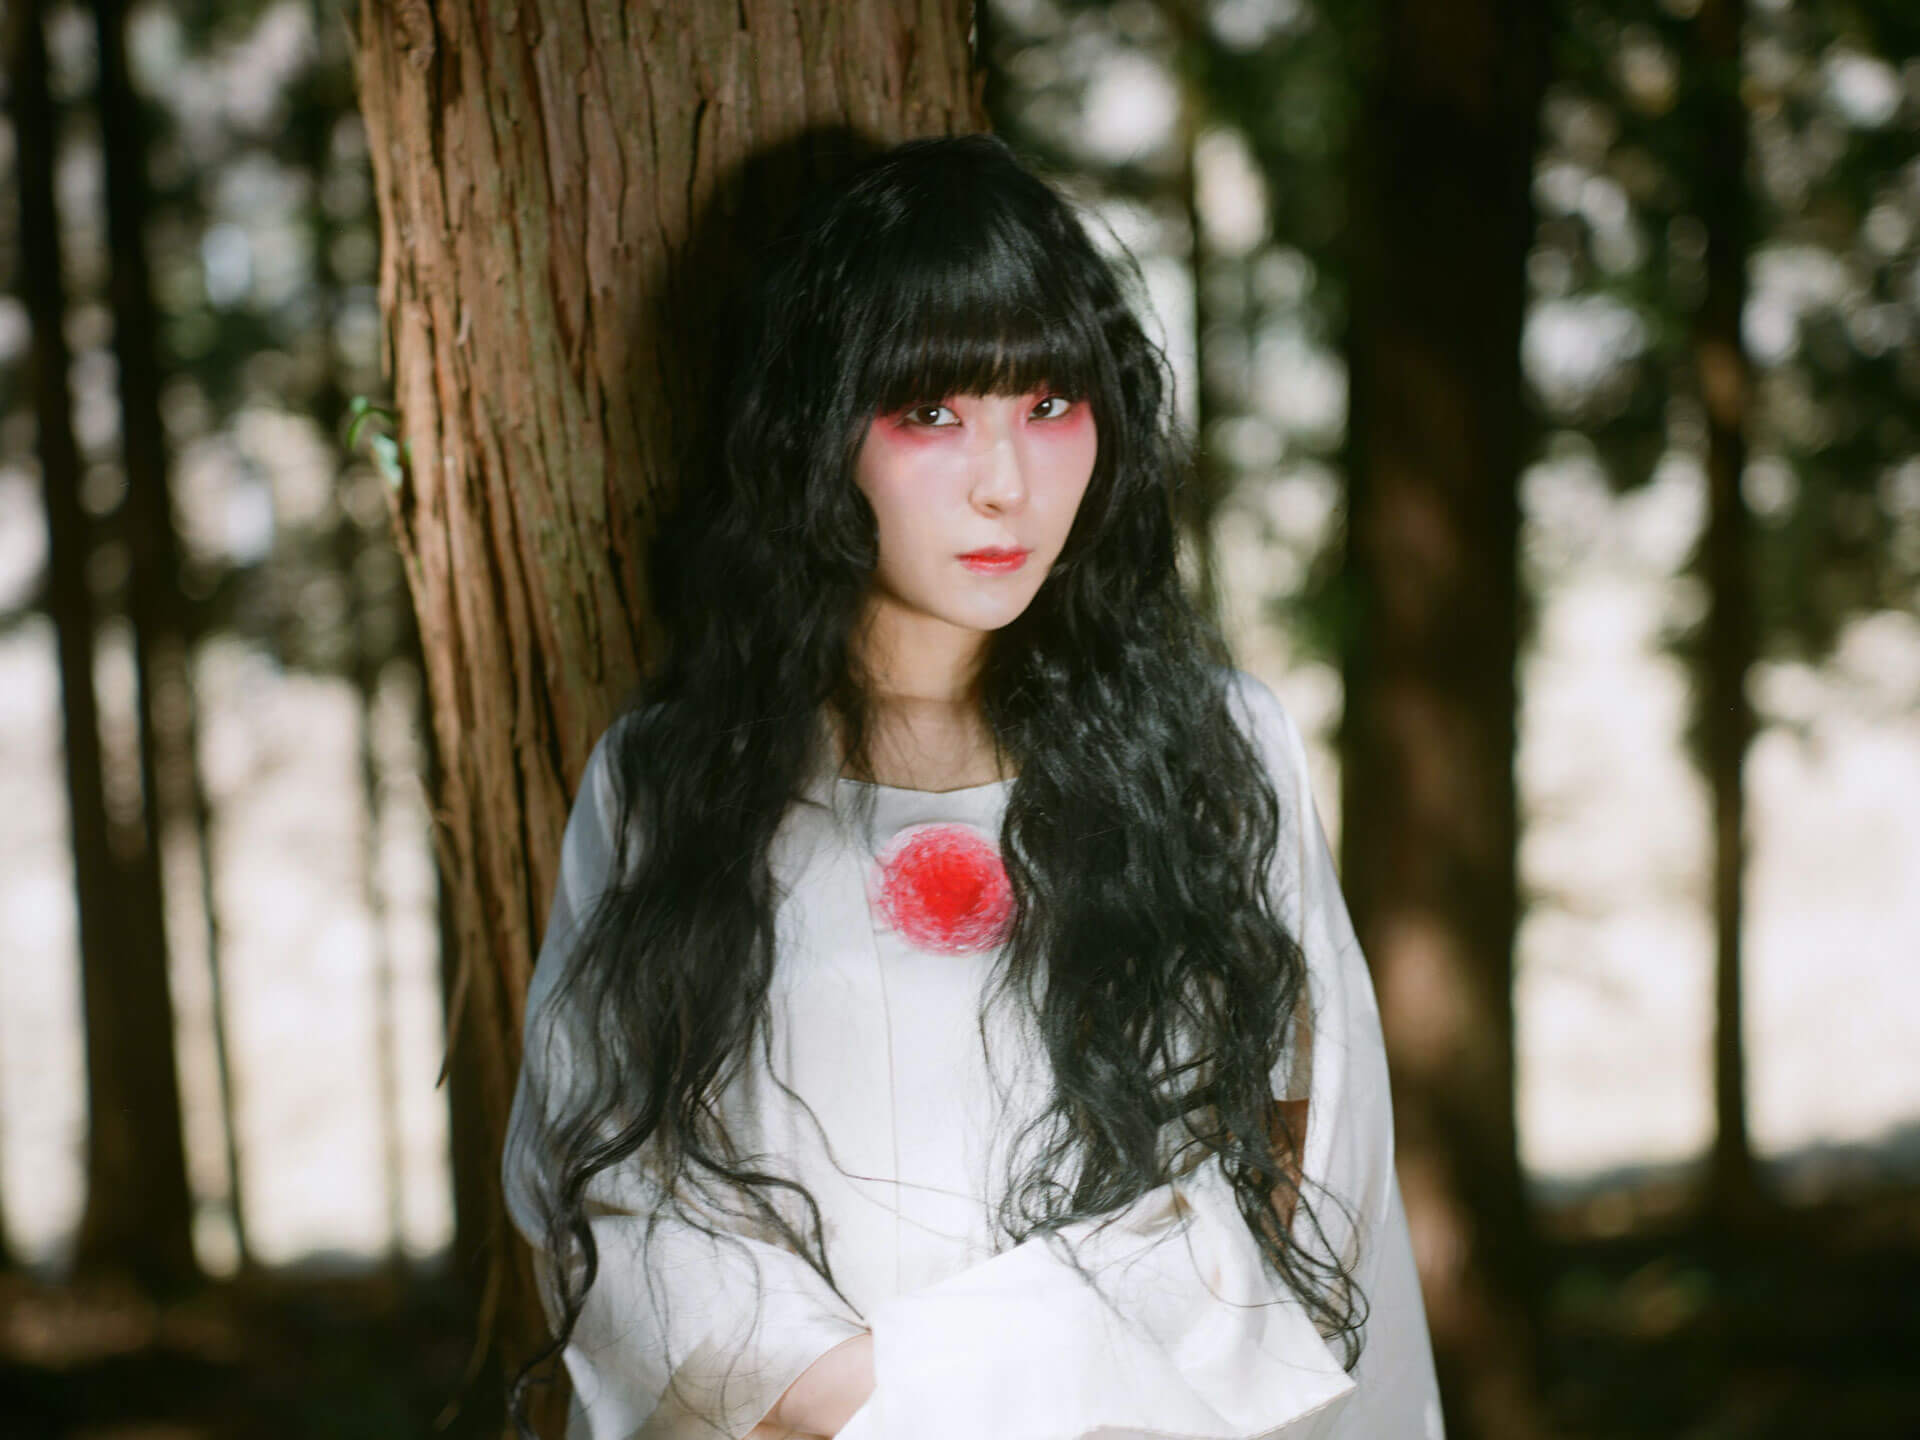 SUPER DOMMUNEにて配信されるDAOKOの4thアルバム『anima』リリース記念ARライブの詳細が公開! music200623_daoko_dommune_04